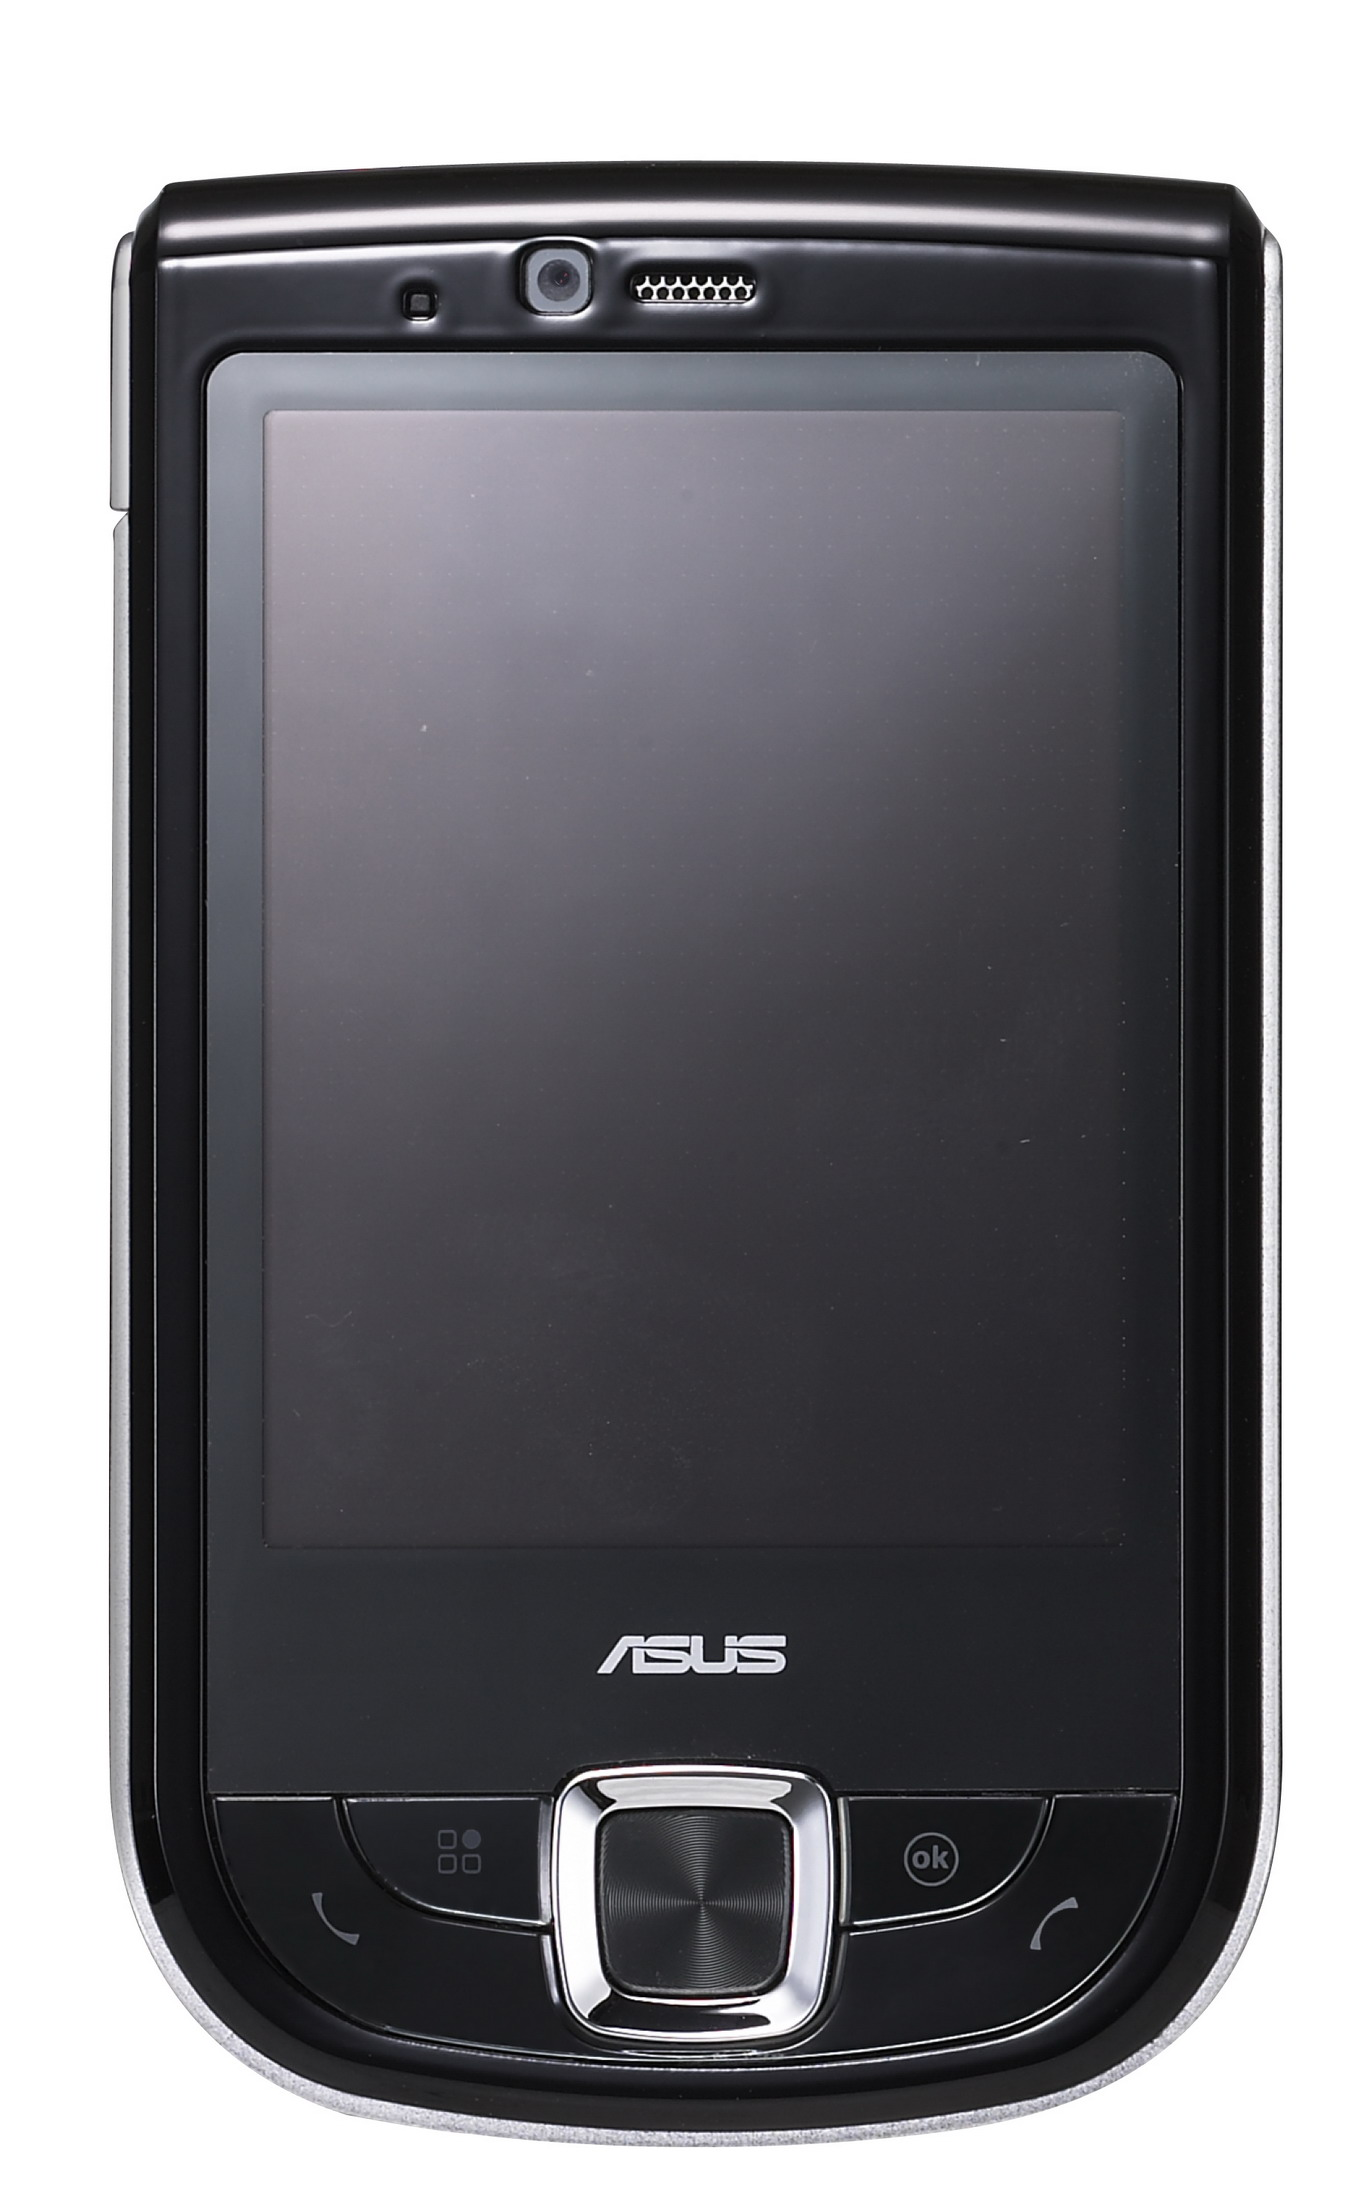 3.5G 全功能PDA 手機 / 華碩電腦股份有限公司